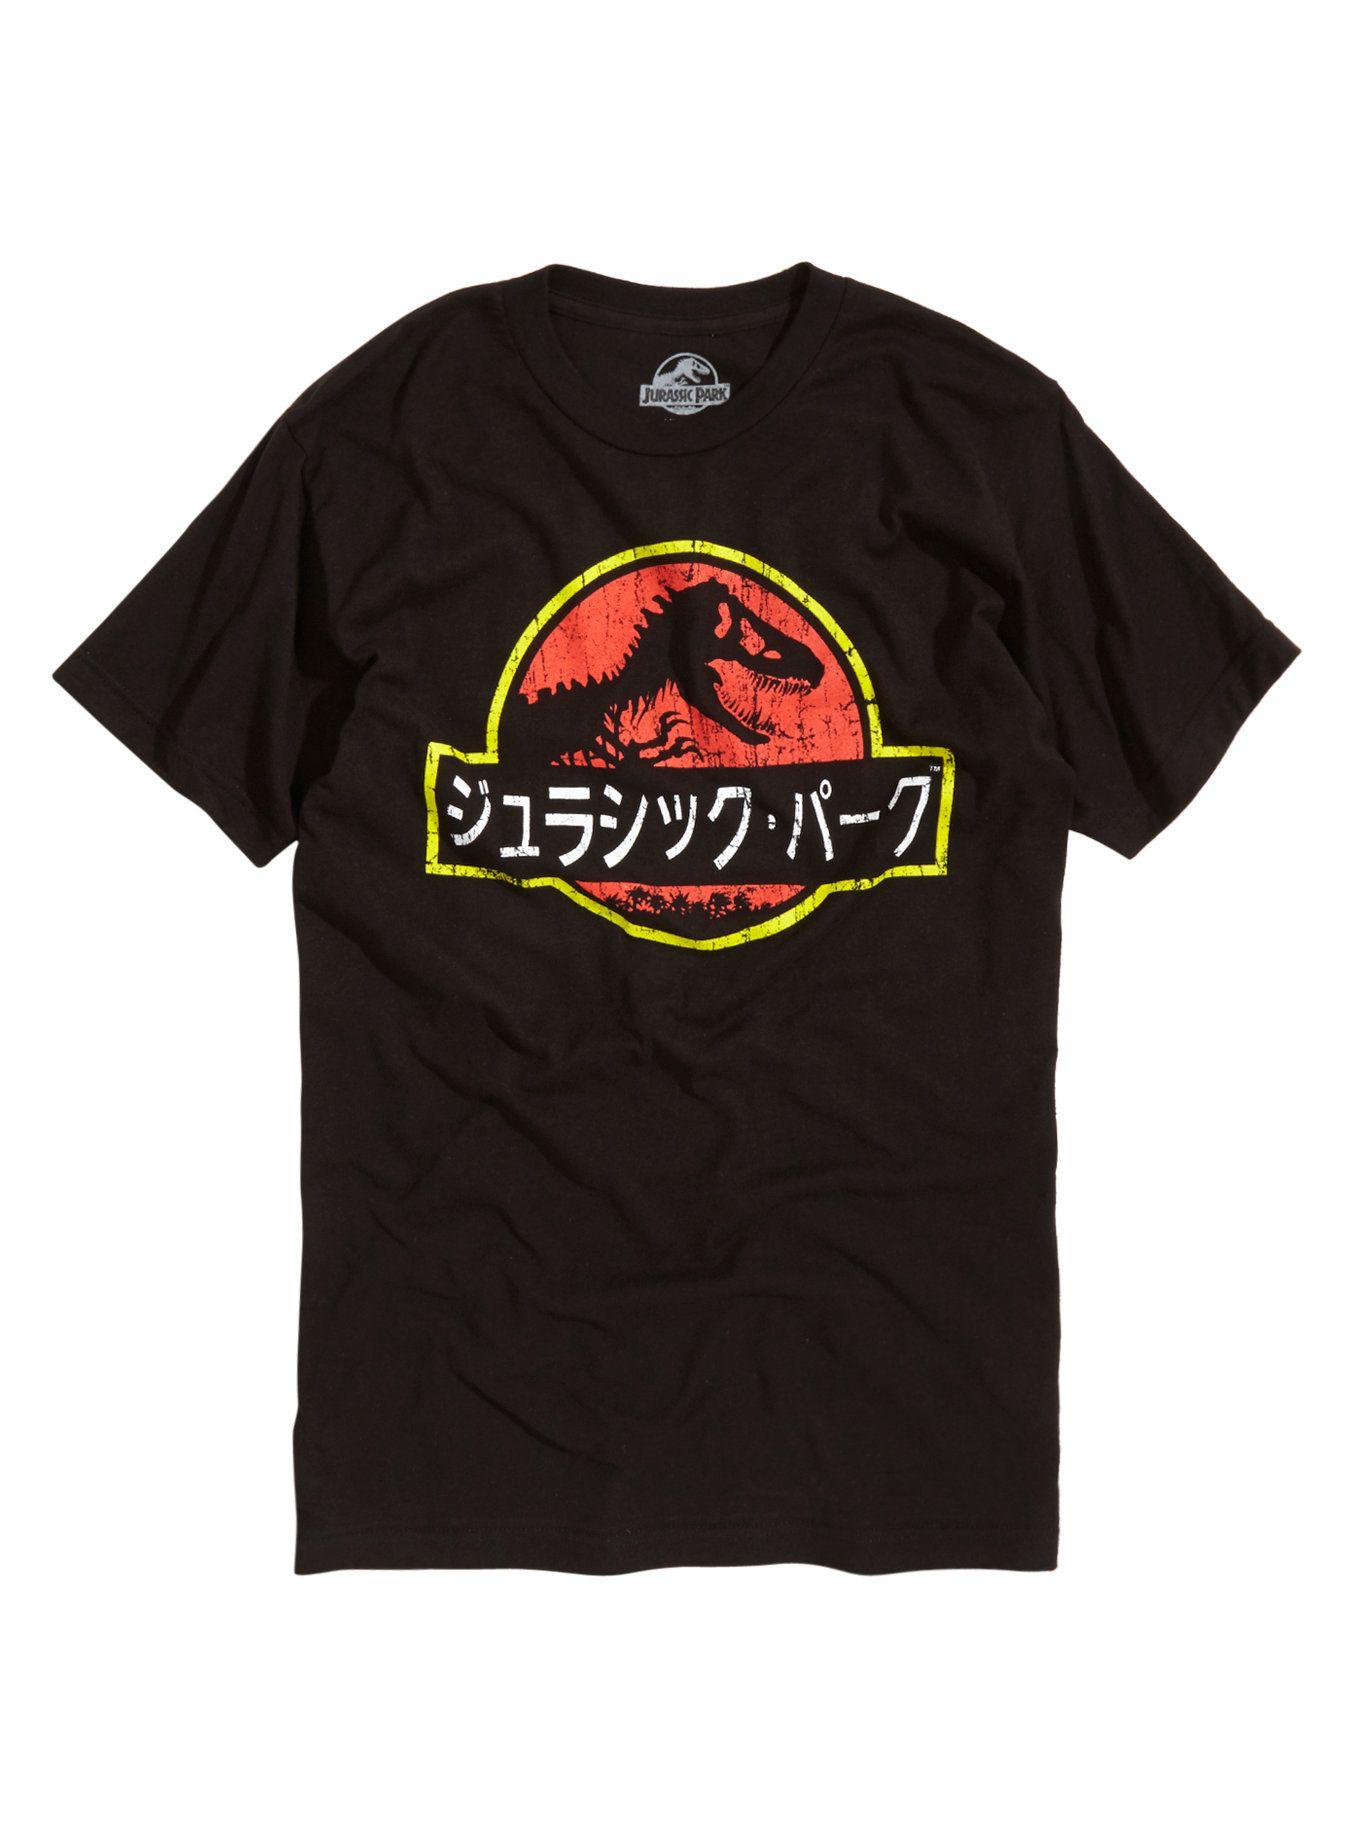 Guys T Shirts Officially Licensed Movie Tees Hot Topic Jurassic Park T Shirt Tshirt Logo Shirts